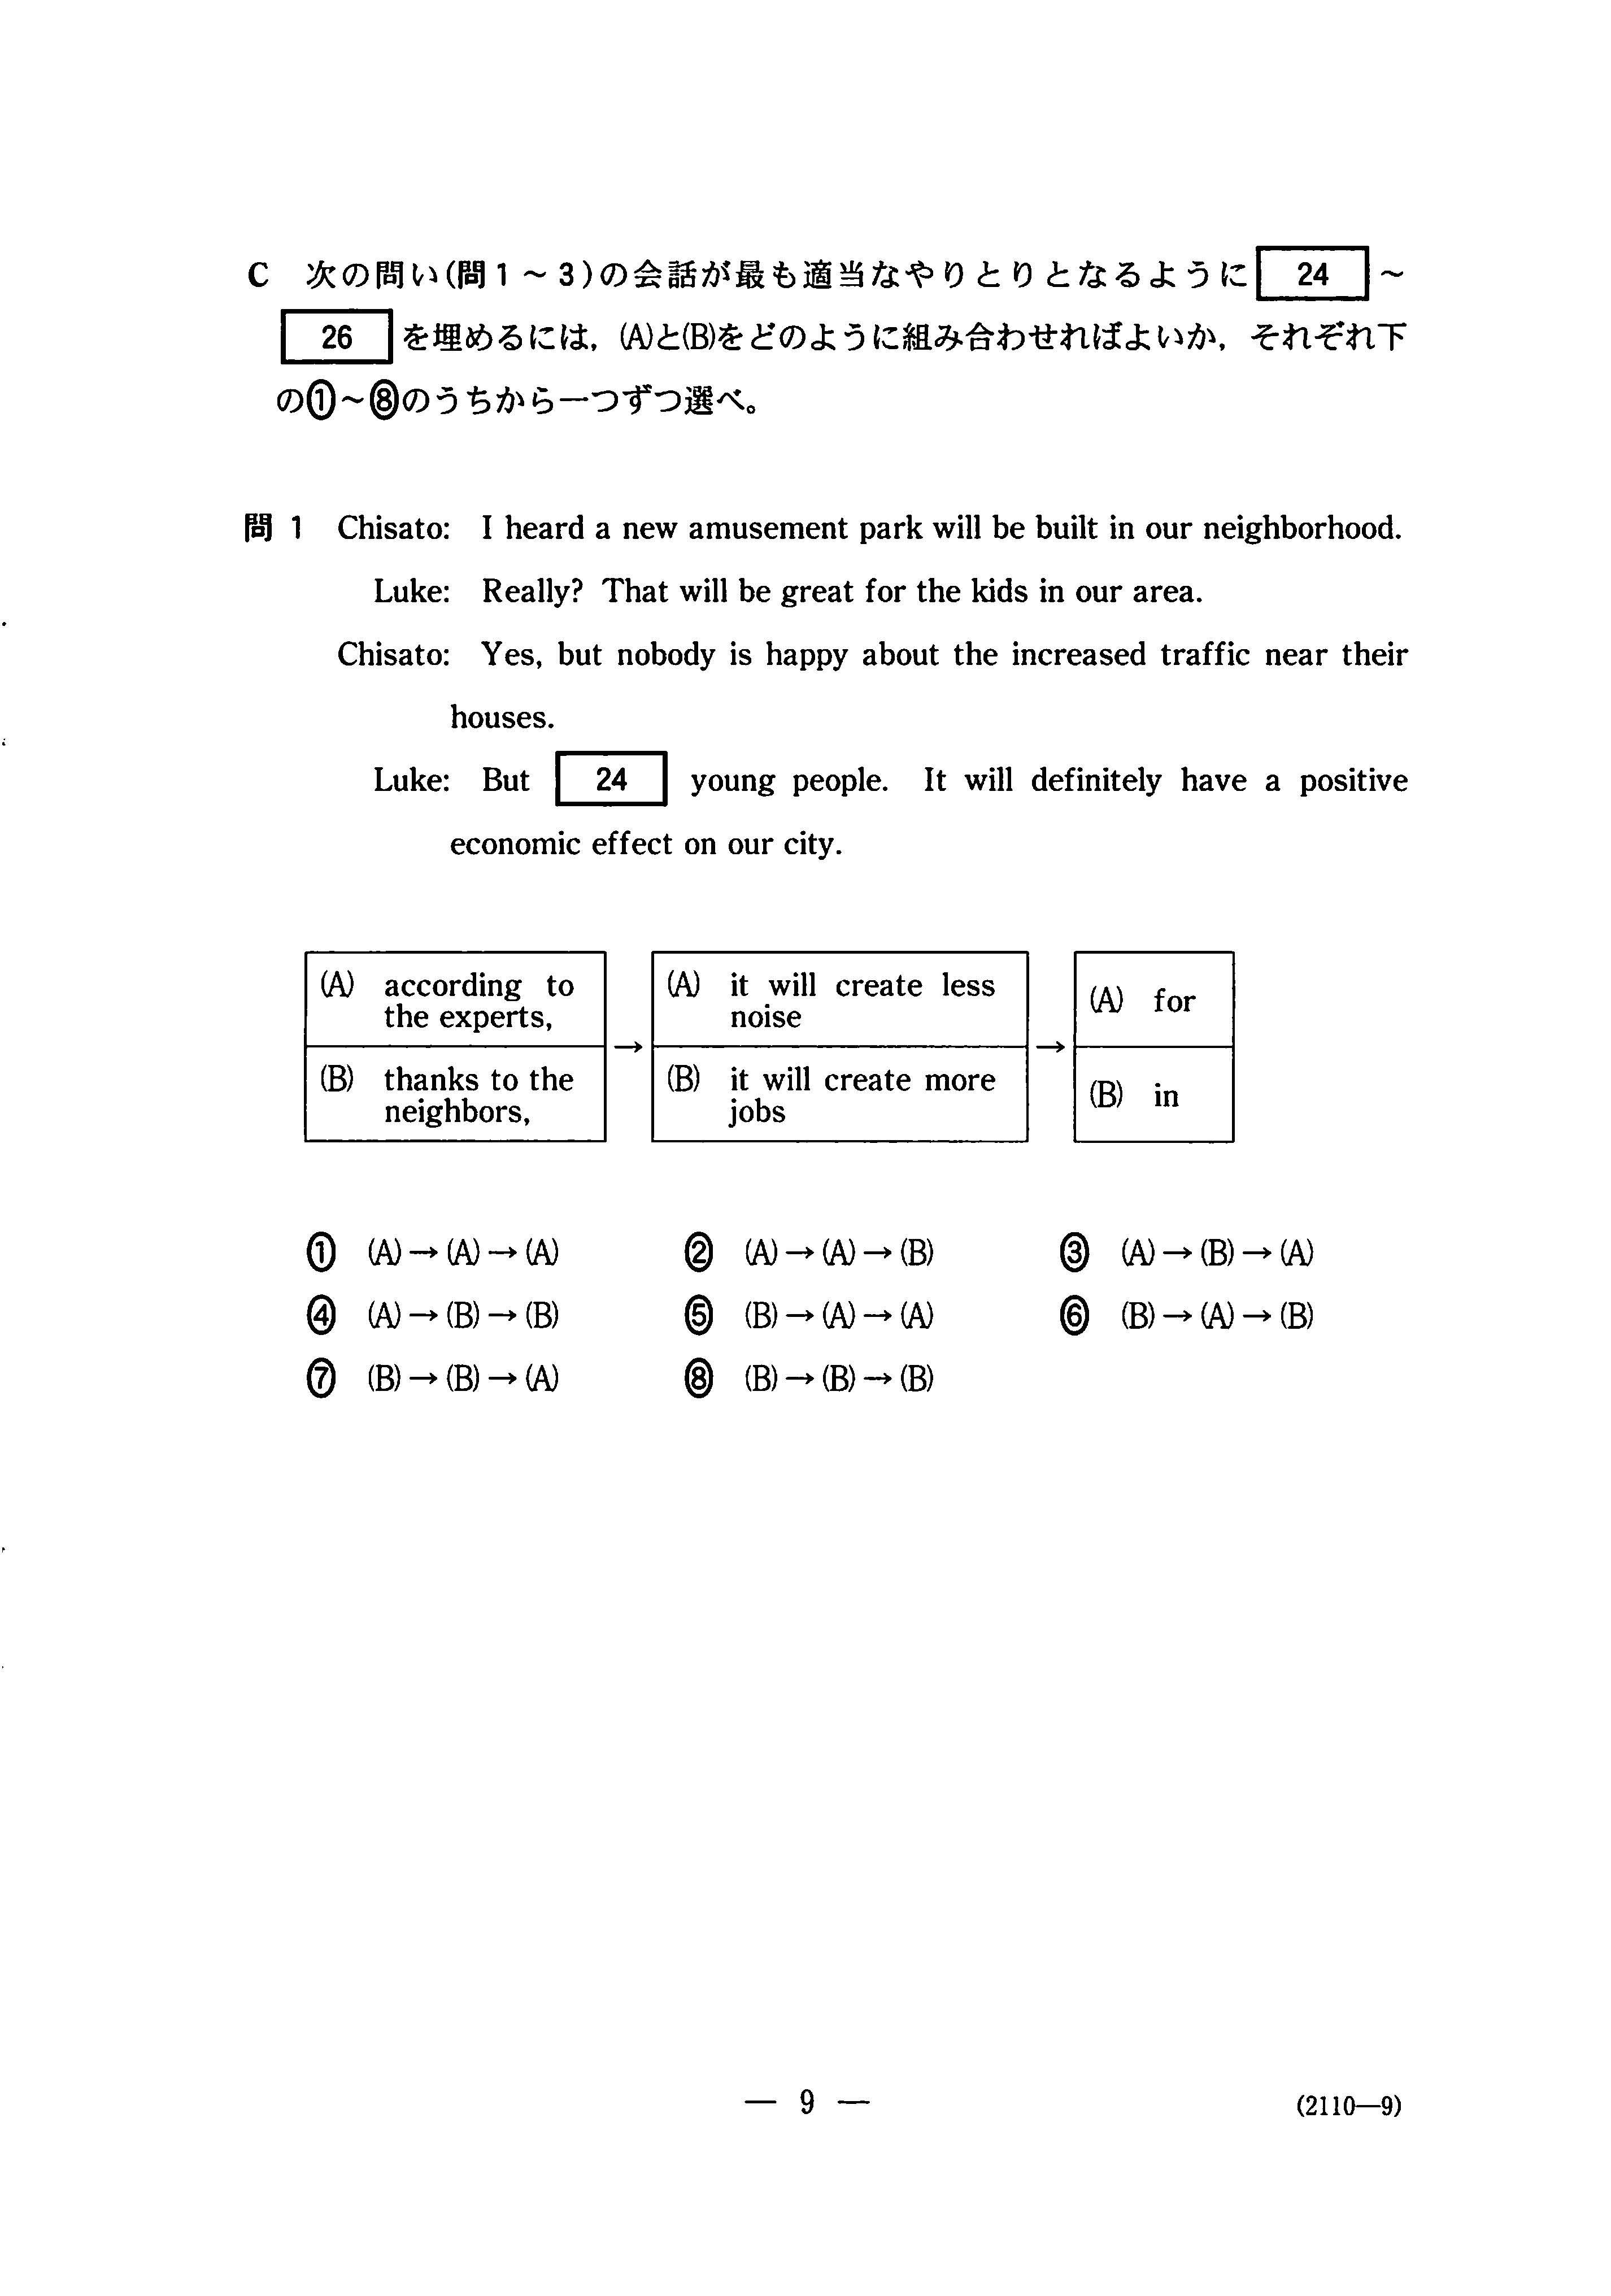 英語(筆記) 外国語|2020年 令和2年 センター試験過去問題